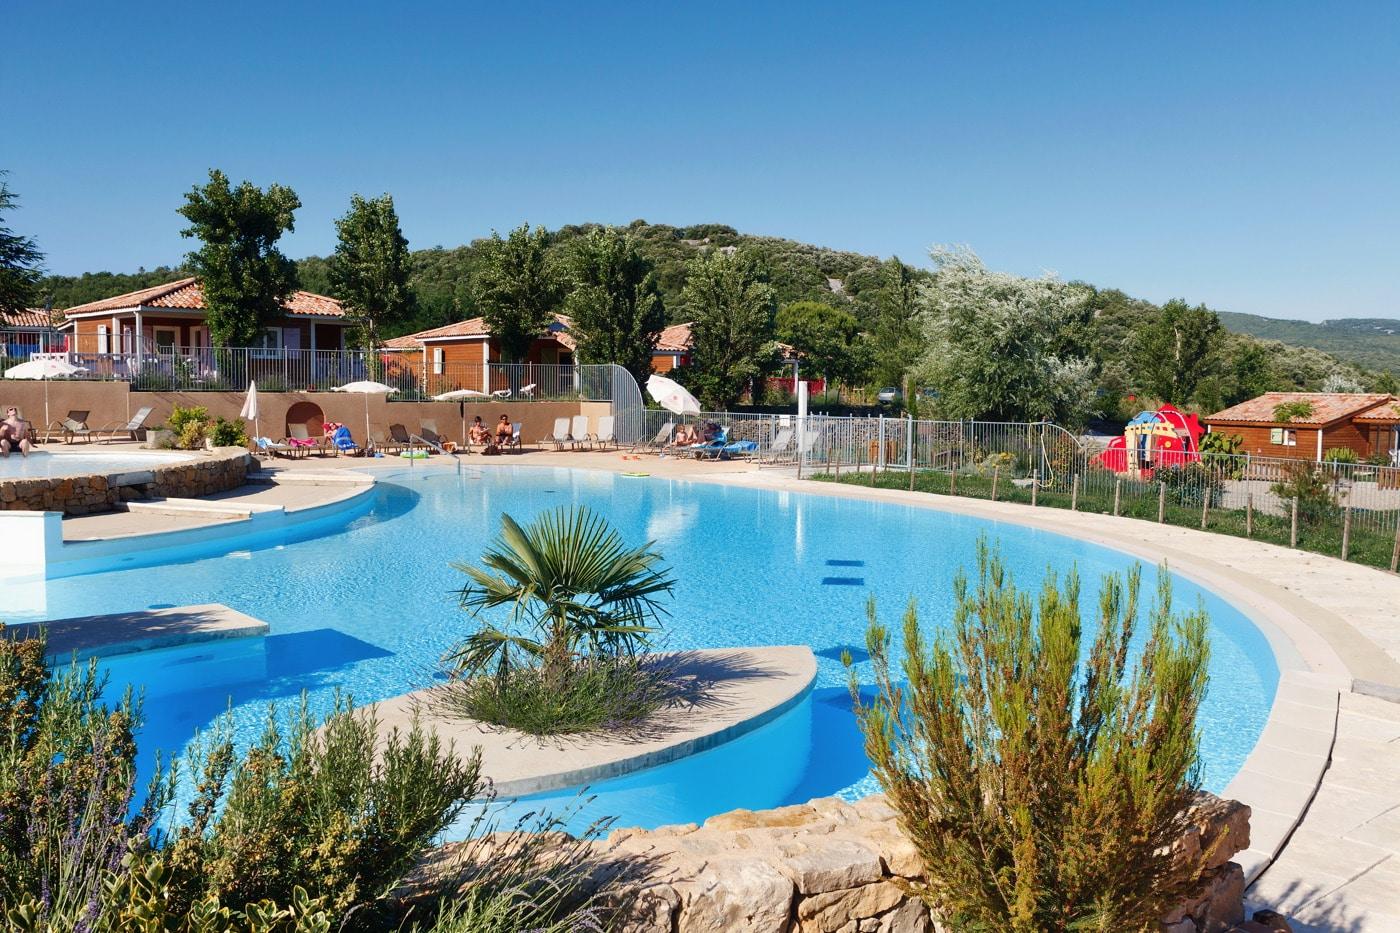 domaine sevenier camping 5 etoiles ardeche piscine galerie photo 16 - Accueil